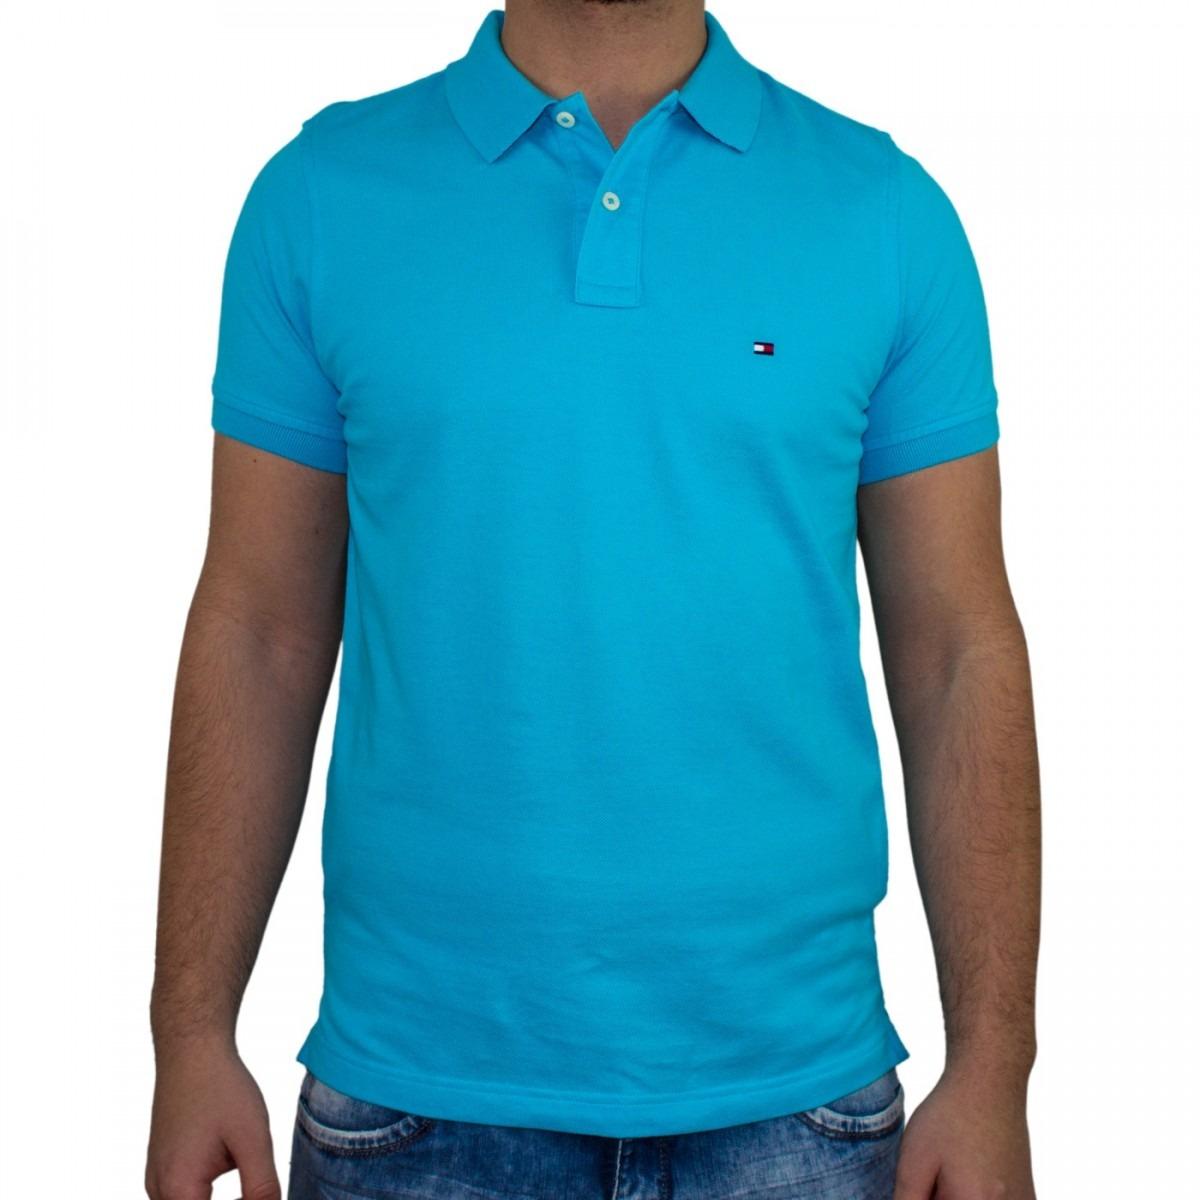 63ab150043ae7 camisa polo masculina tommy hilfiger slim th0857869129. Carregando zoom.